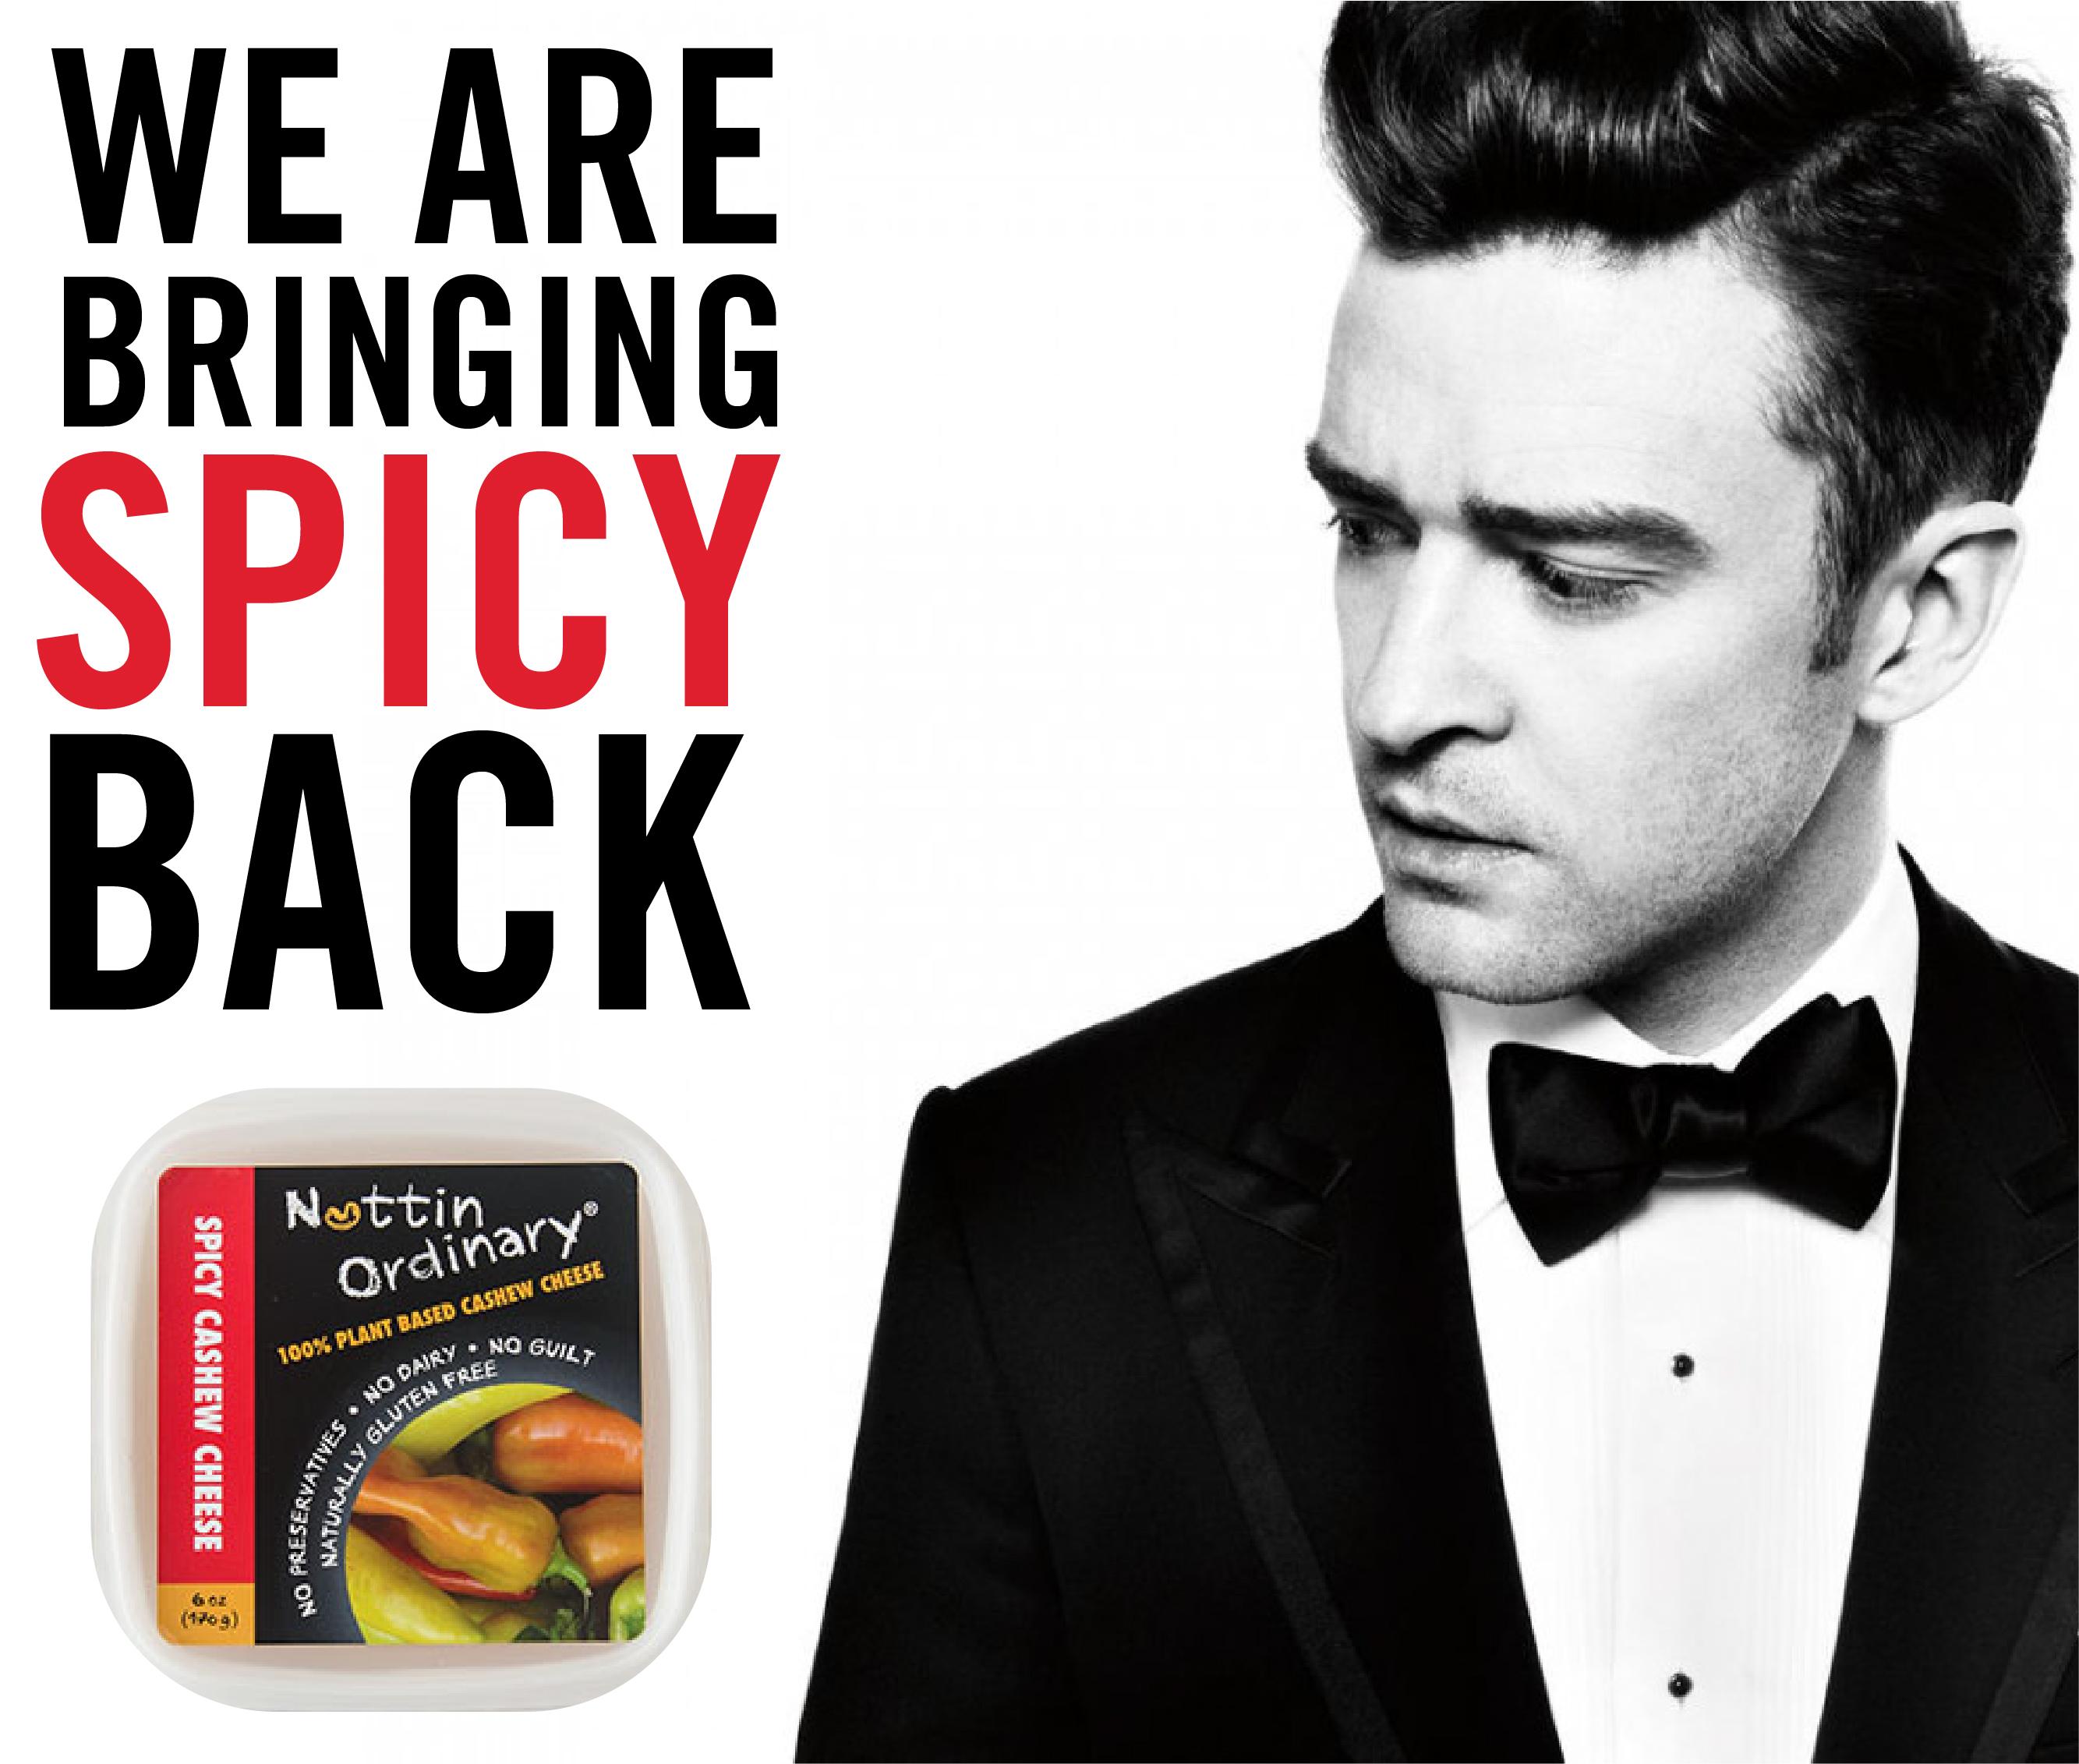 Bringing Spicy Back